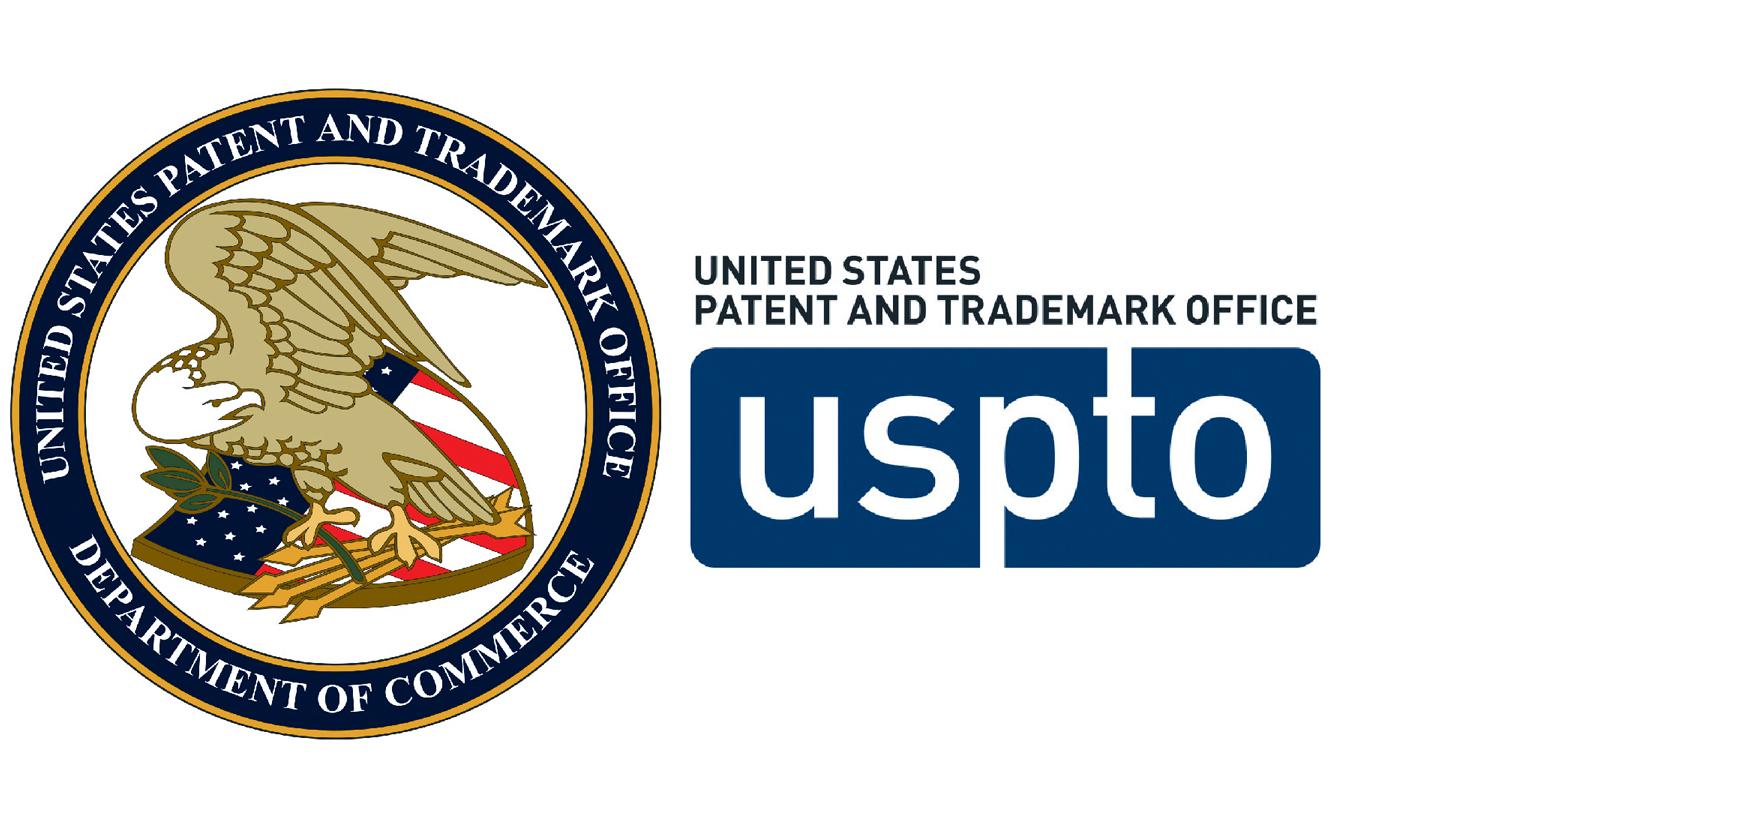 ES18 USPTO logo REV2.jpg